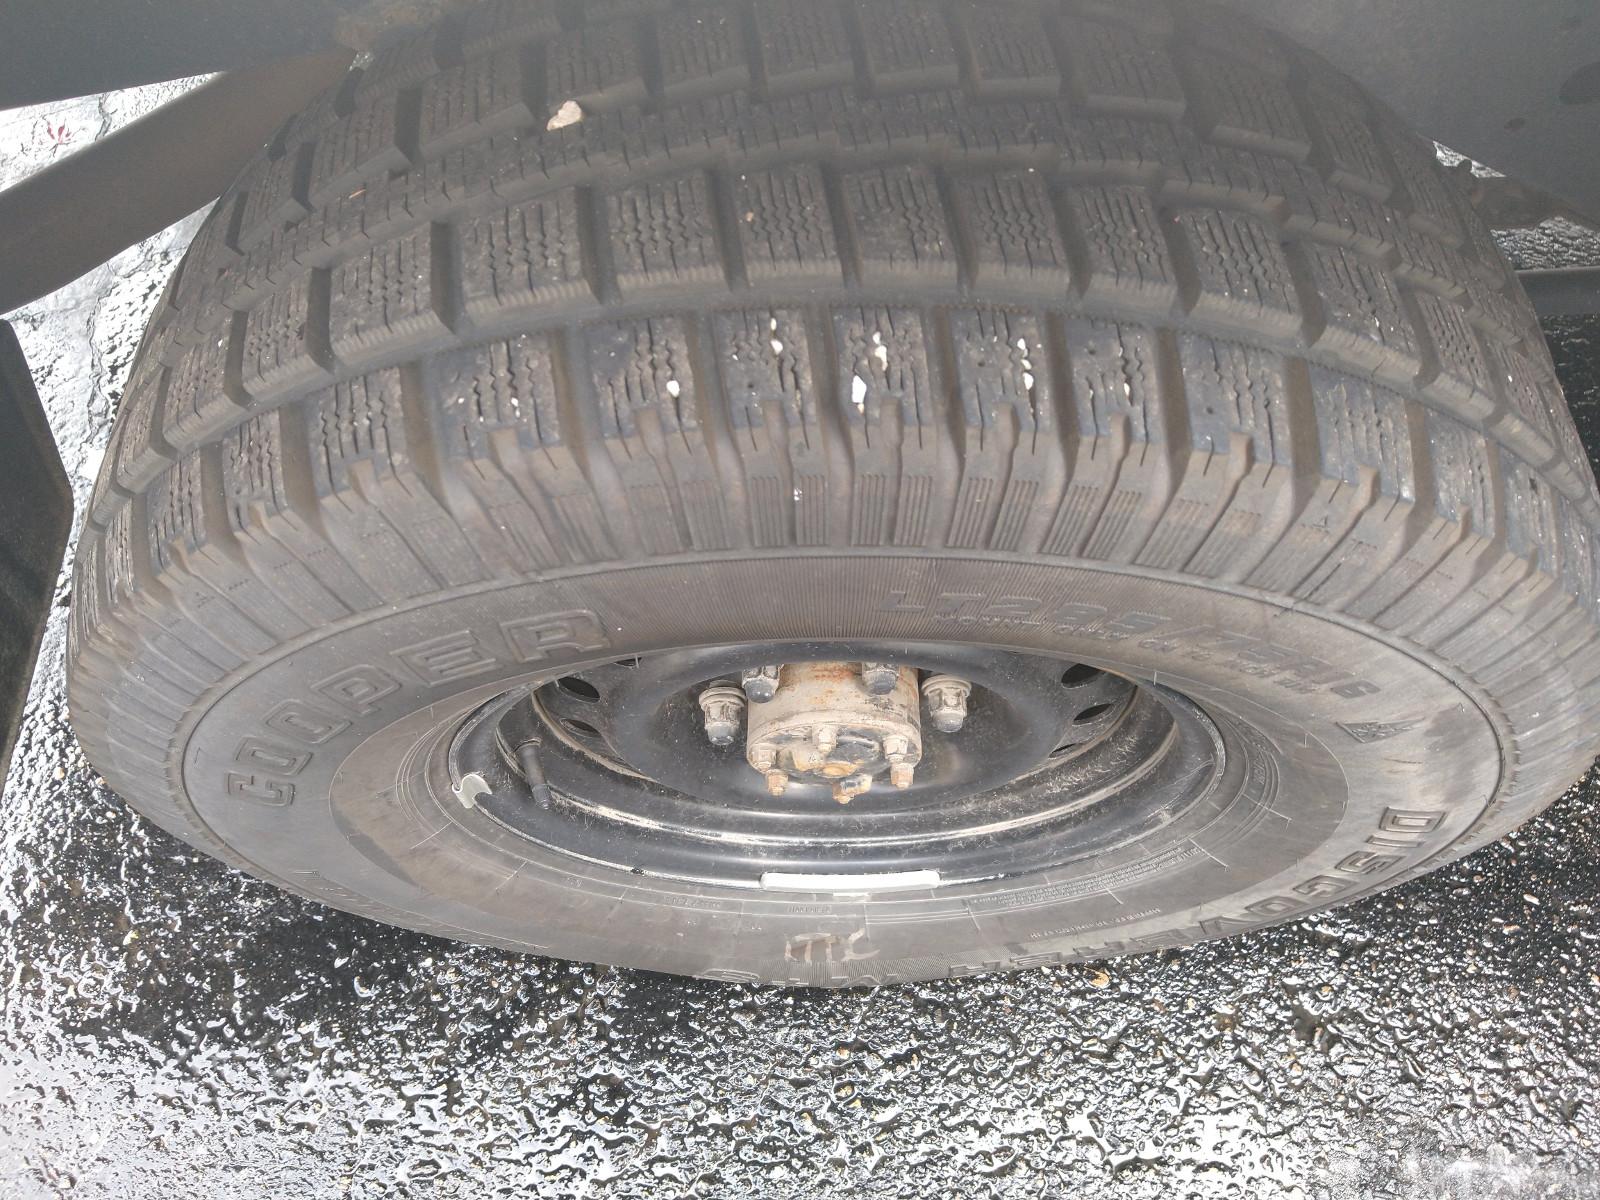 mounted_snow_tire.jpg